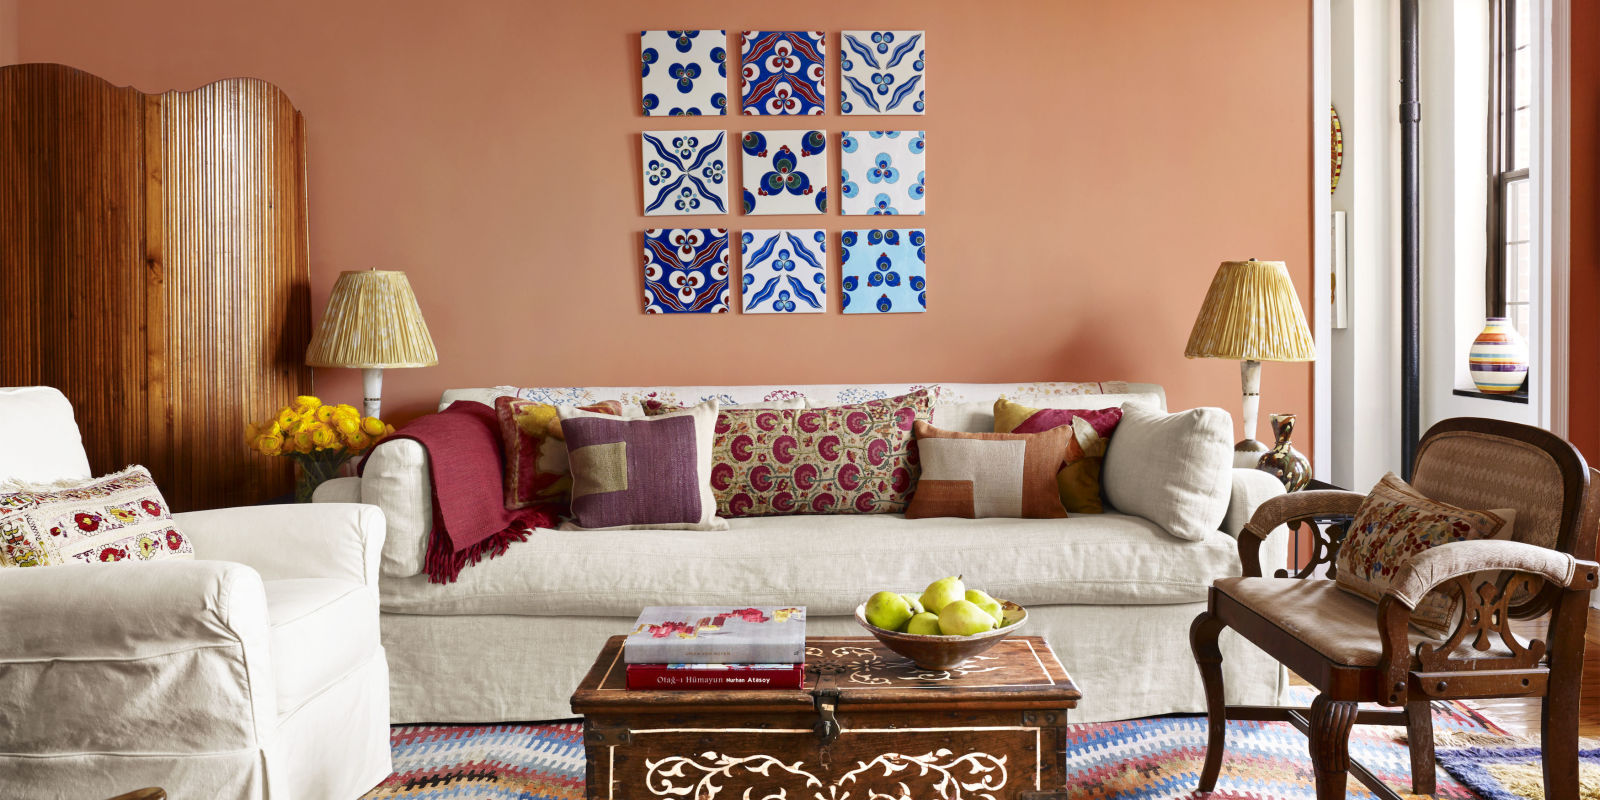 Some Home Decorating Ideas And Tips: Sara Bengur's Manhattan Apartment